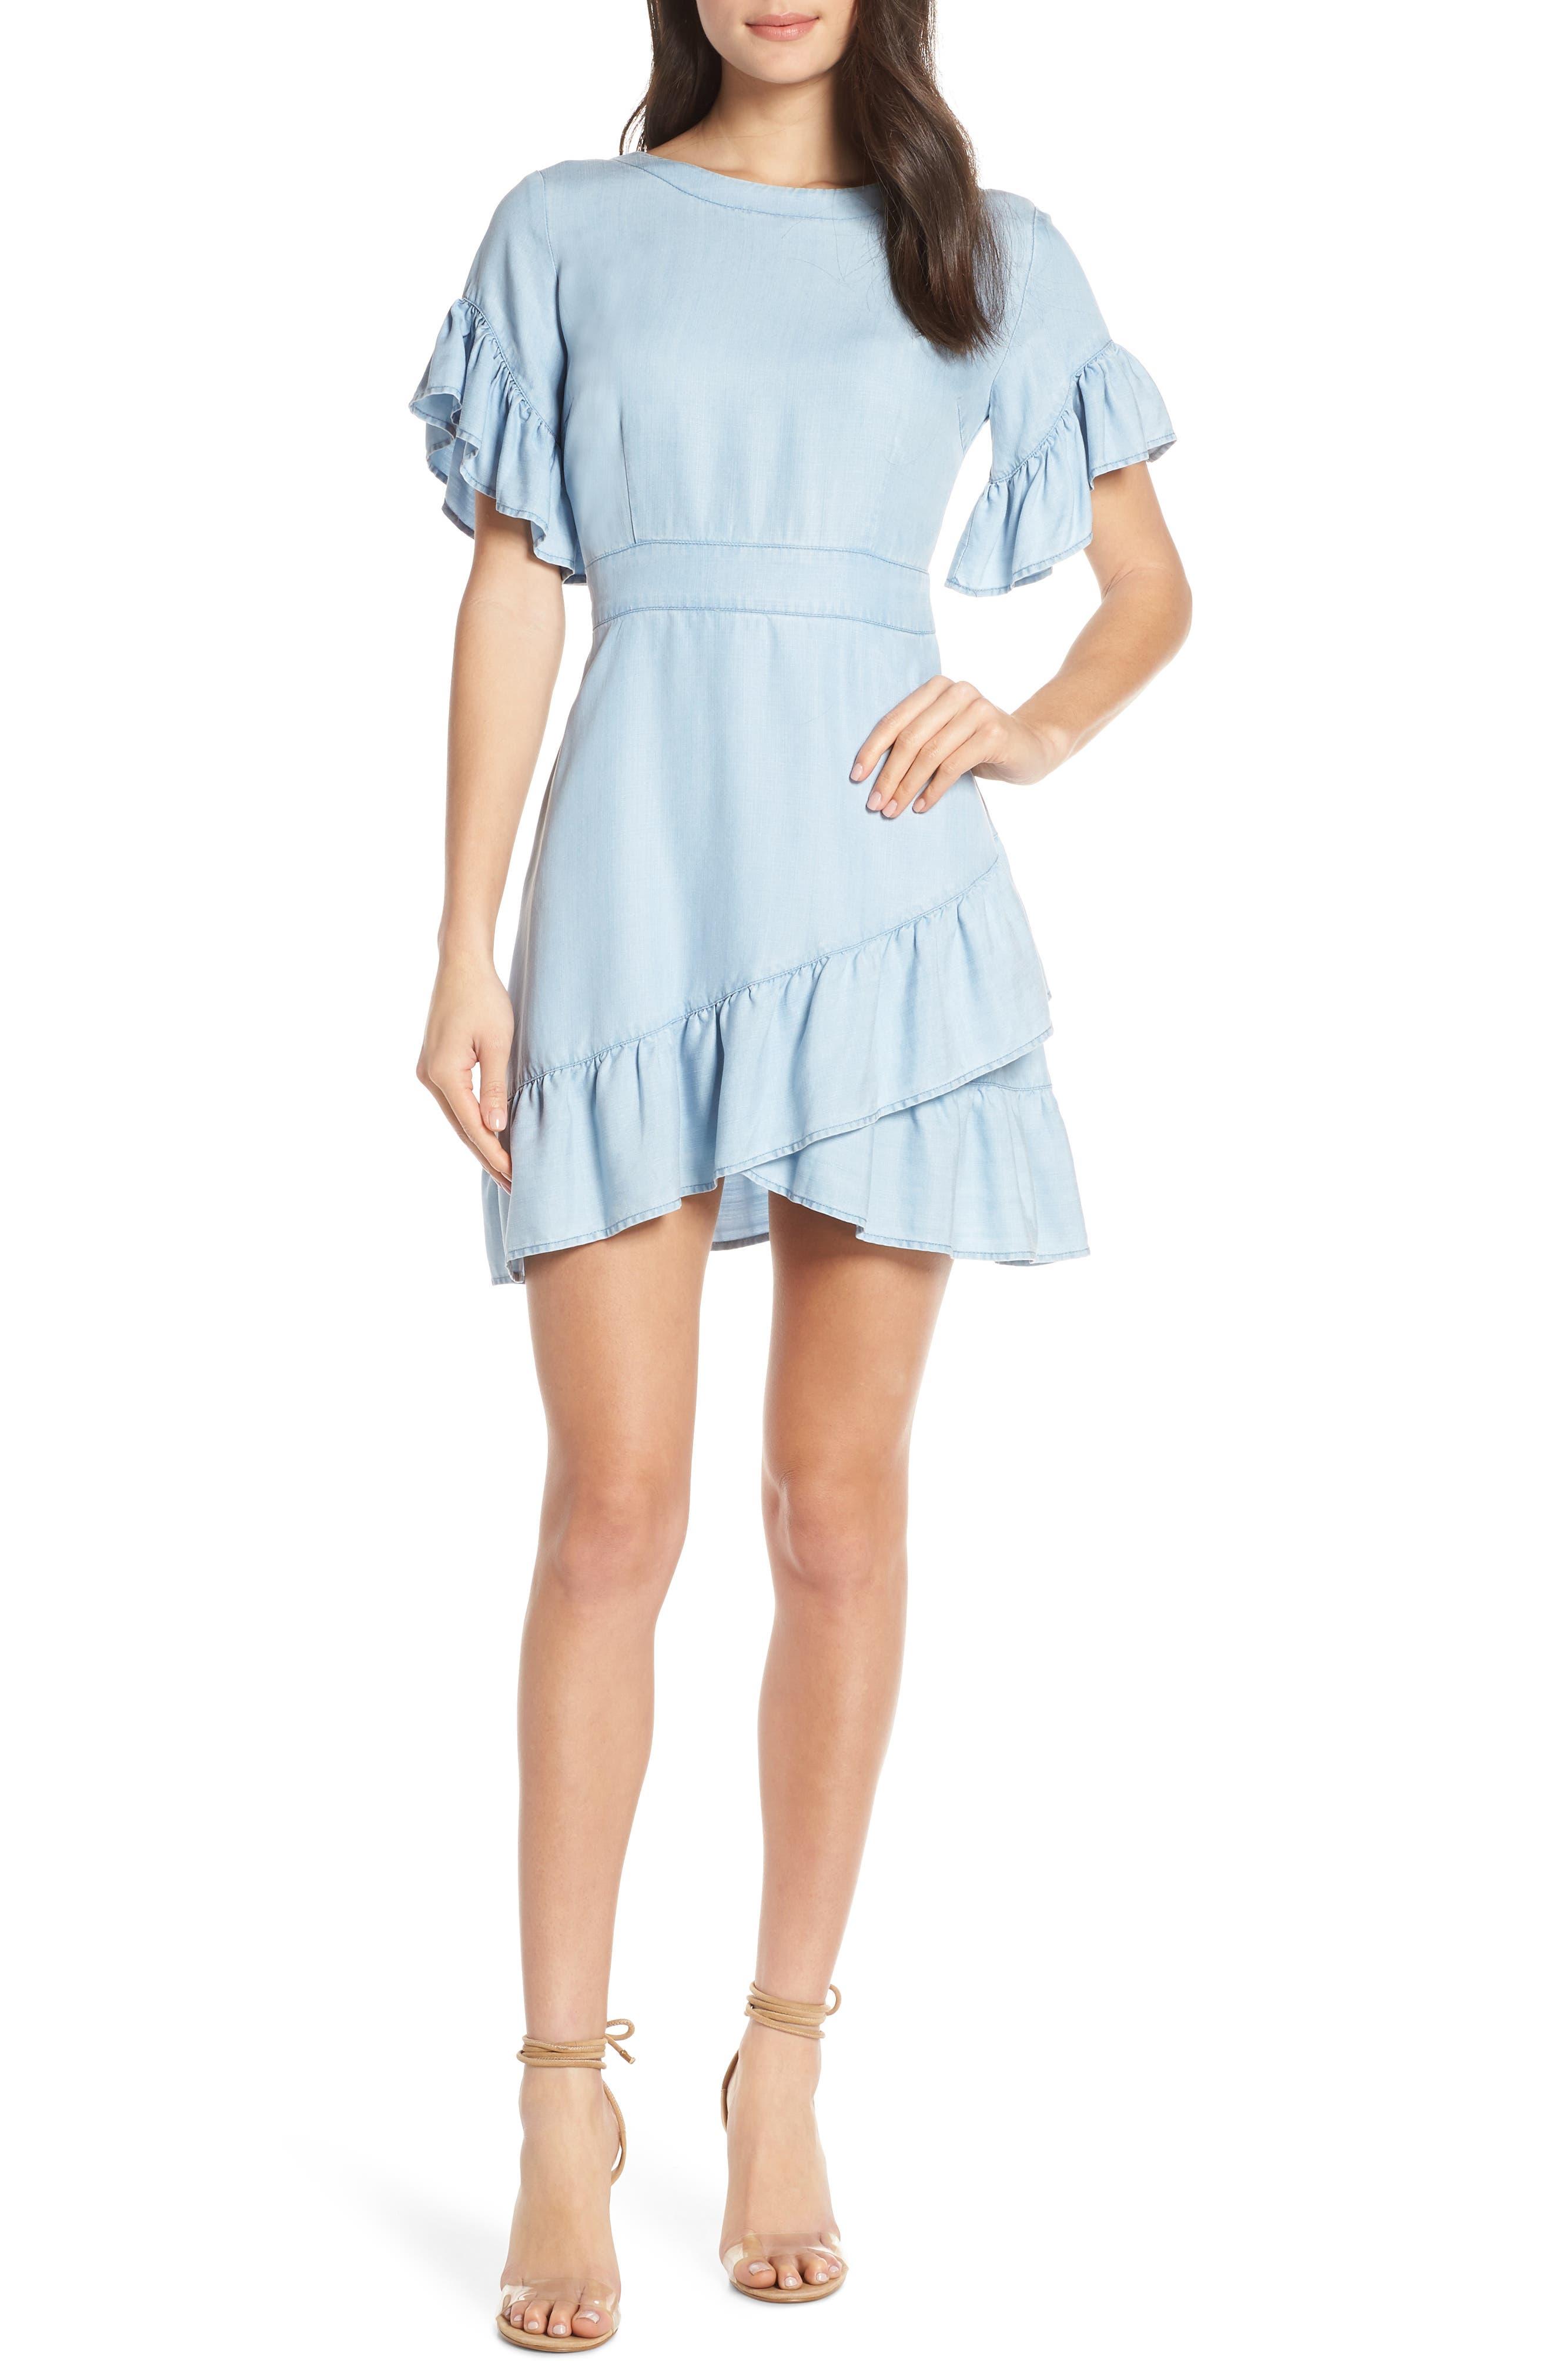 Bb Dakota Indigo Dreams Tulip Dress, Blue